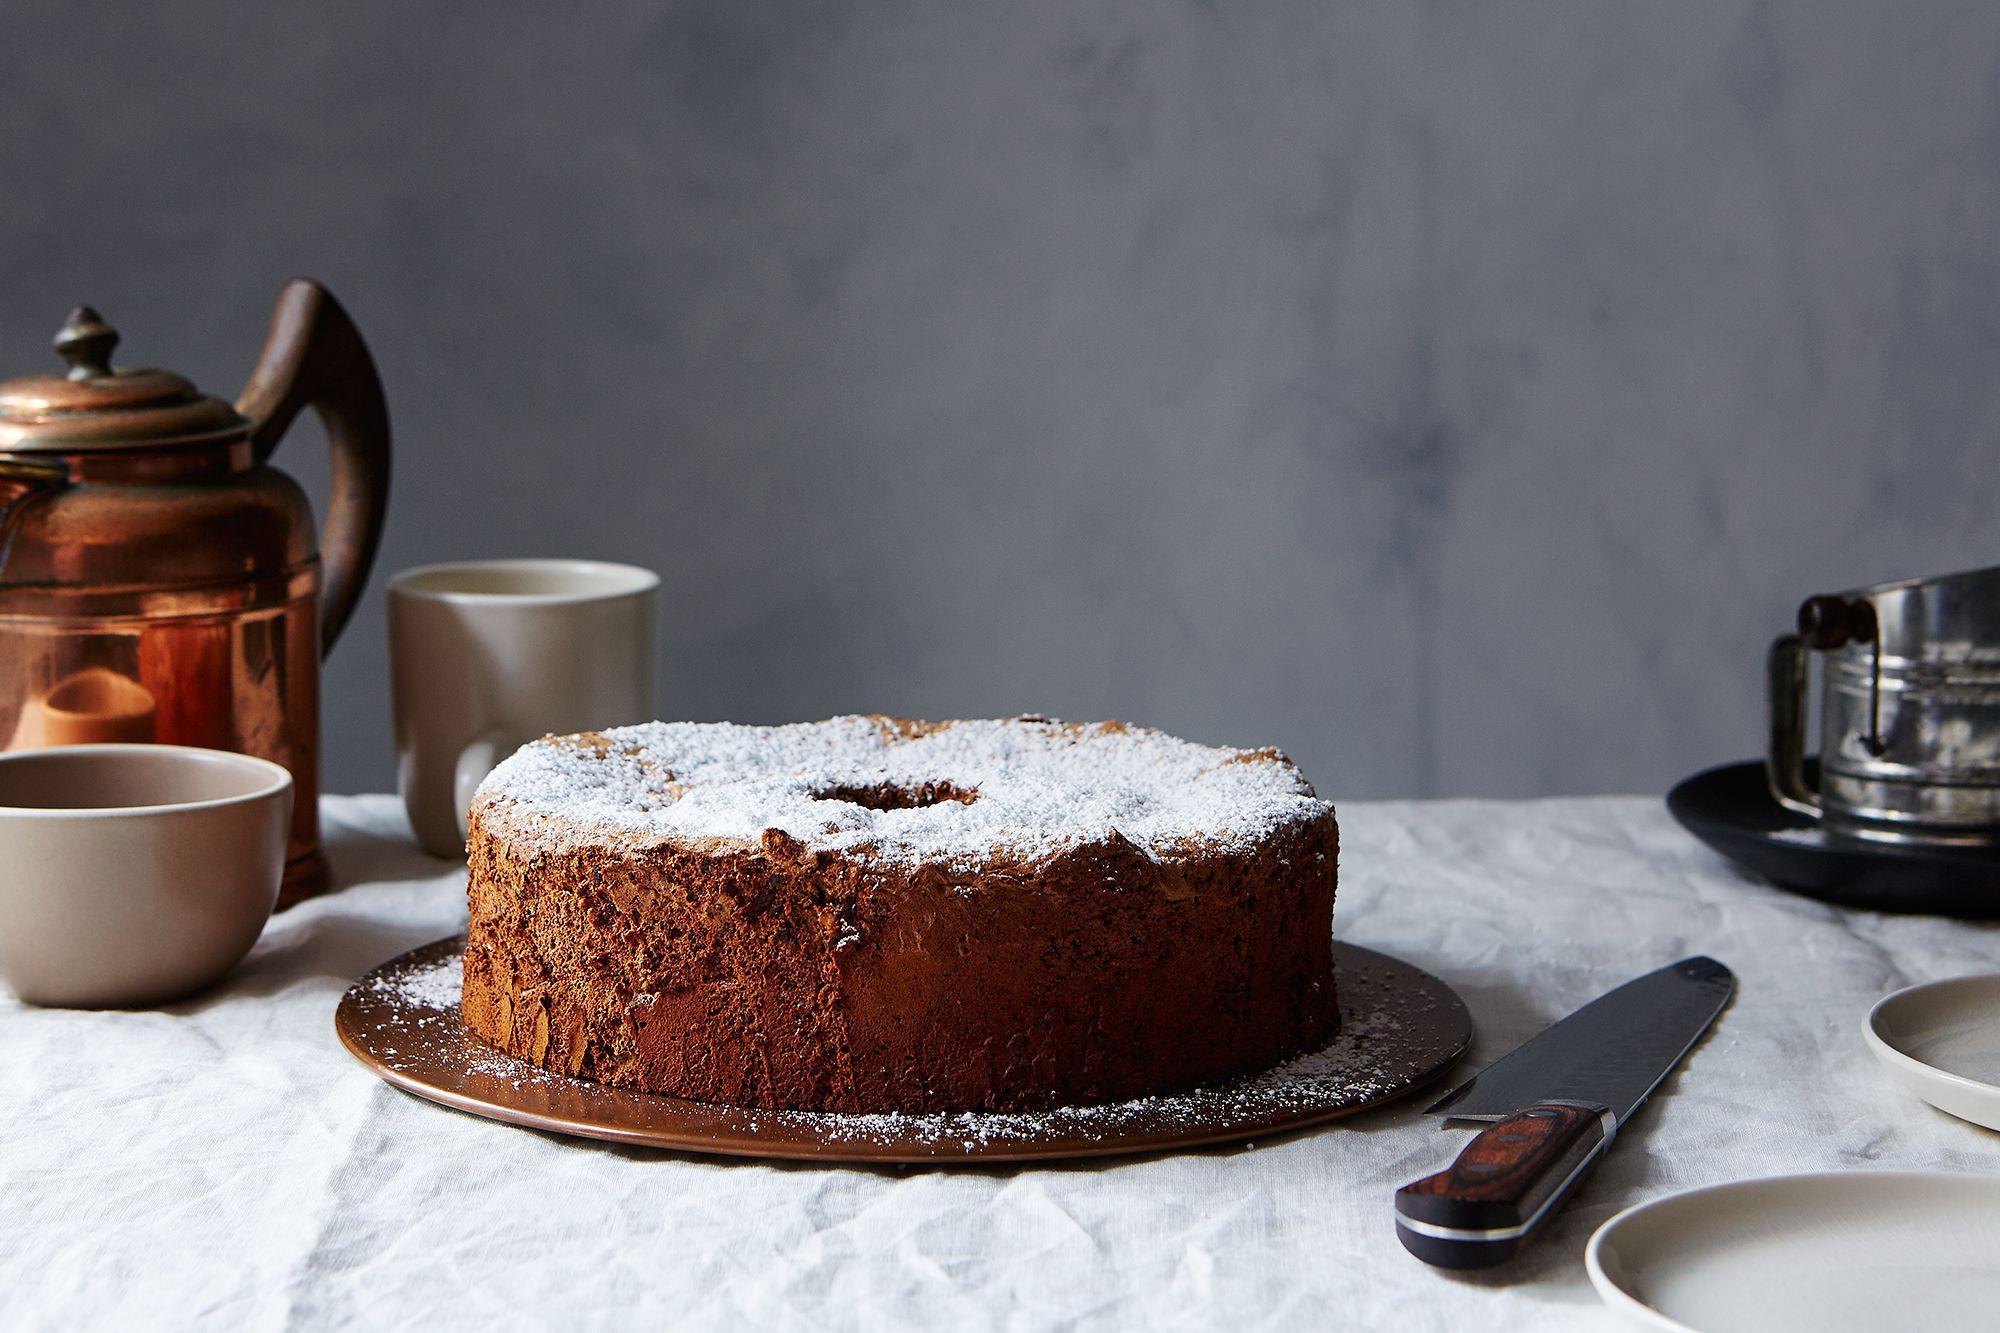 Passover Cake Recipes  Kosher for Passover Chocolate Nut Sponge Cake Recipe